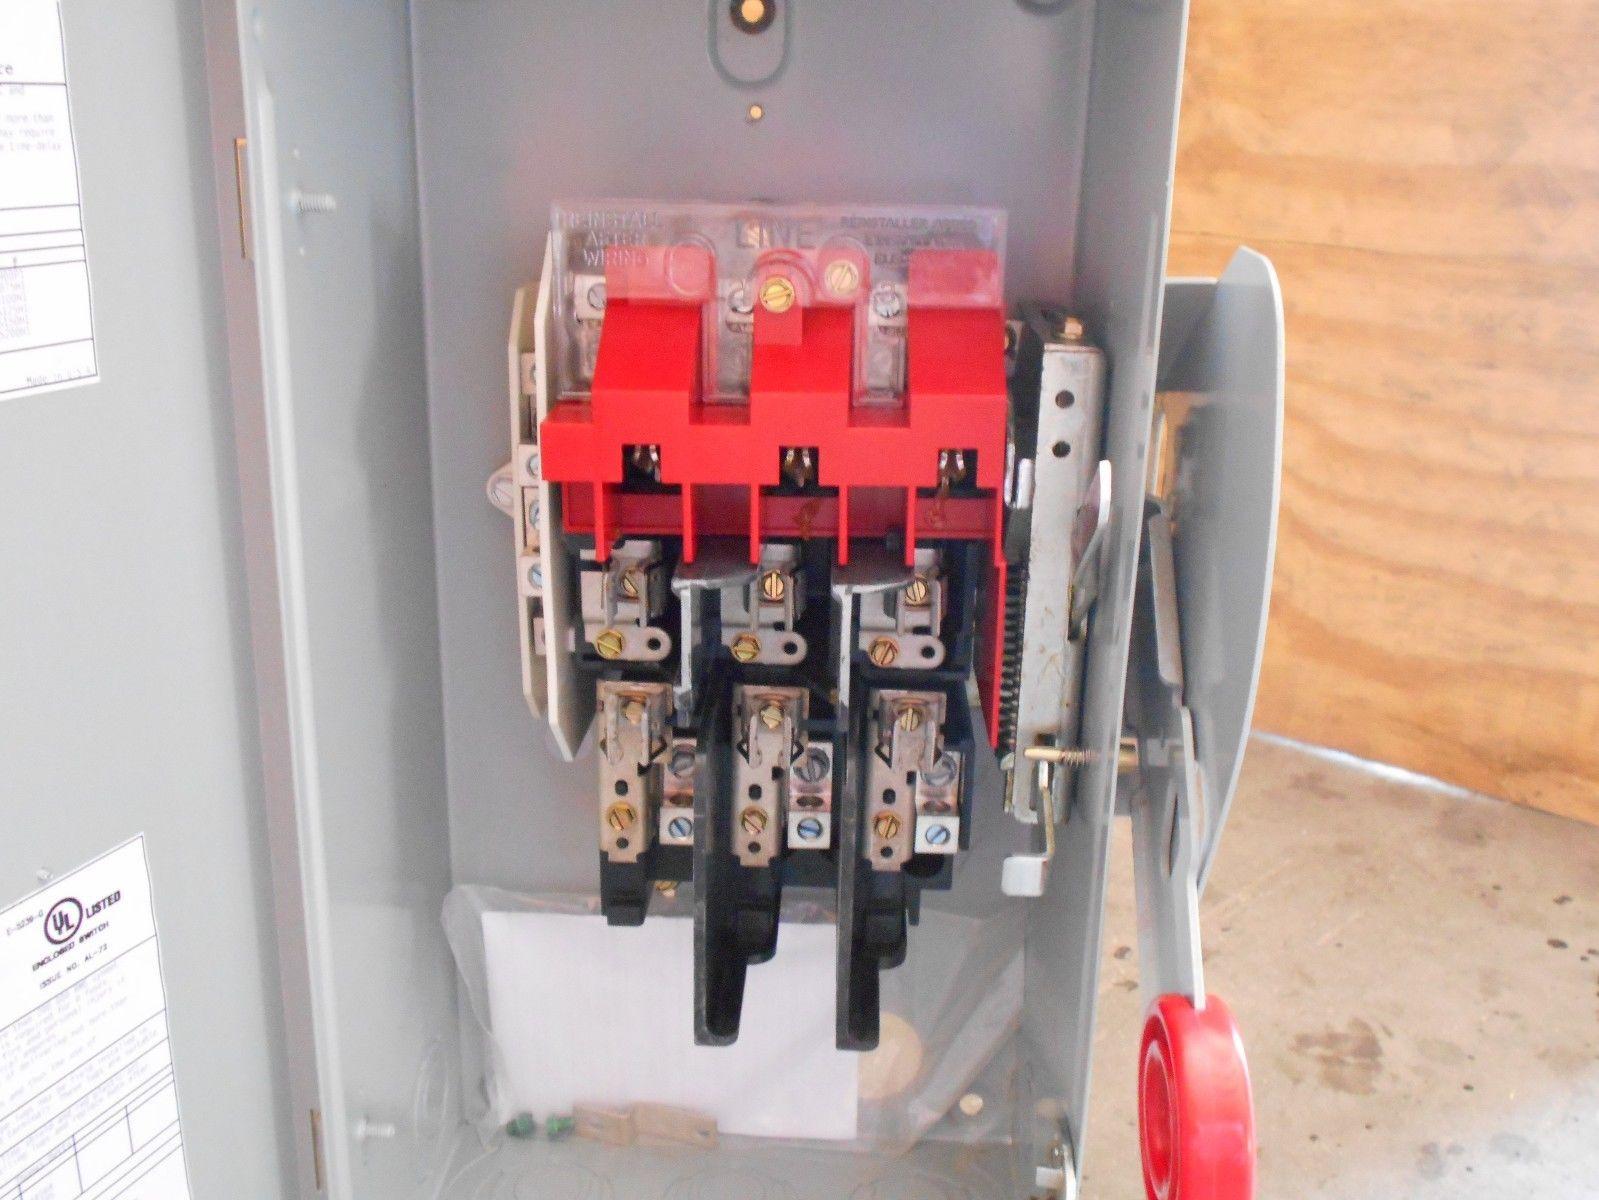 NEW Eaton Cutler-Hammer Heavy Duty Safety Switch Part # DH321NRK NOB ...